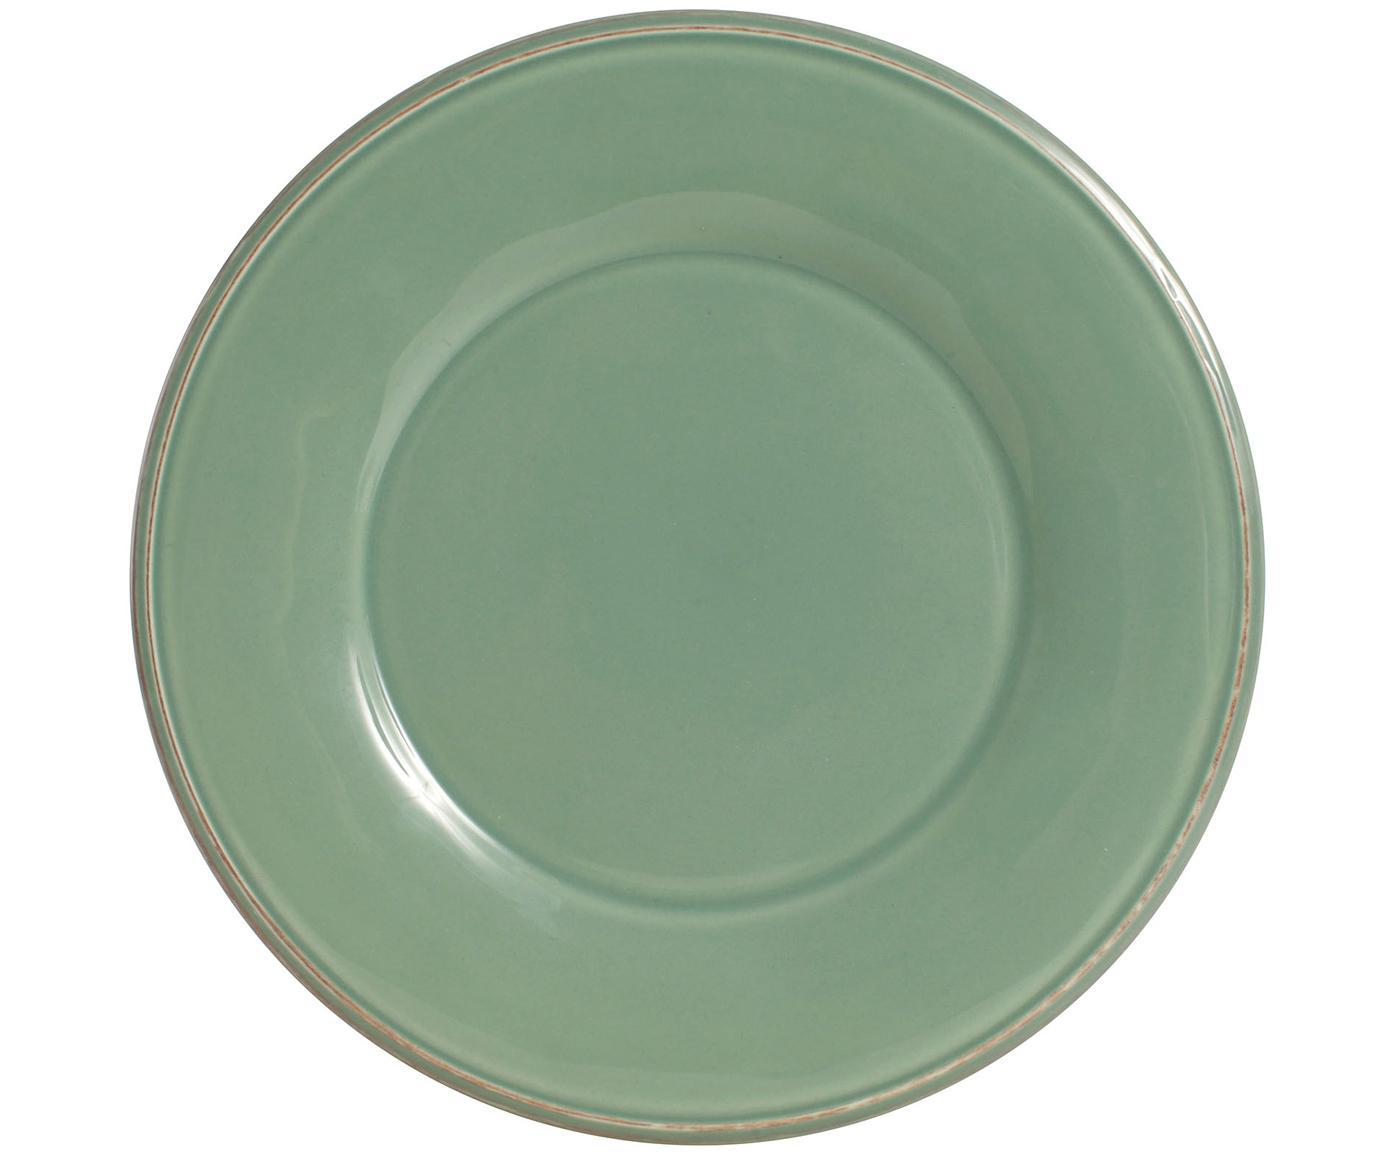 Piatto da colazione verde salvia Constance 2 pz, Ceramica, Verde salvia, Ø 24 cm